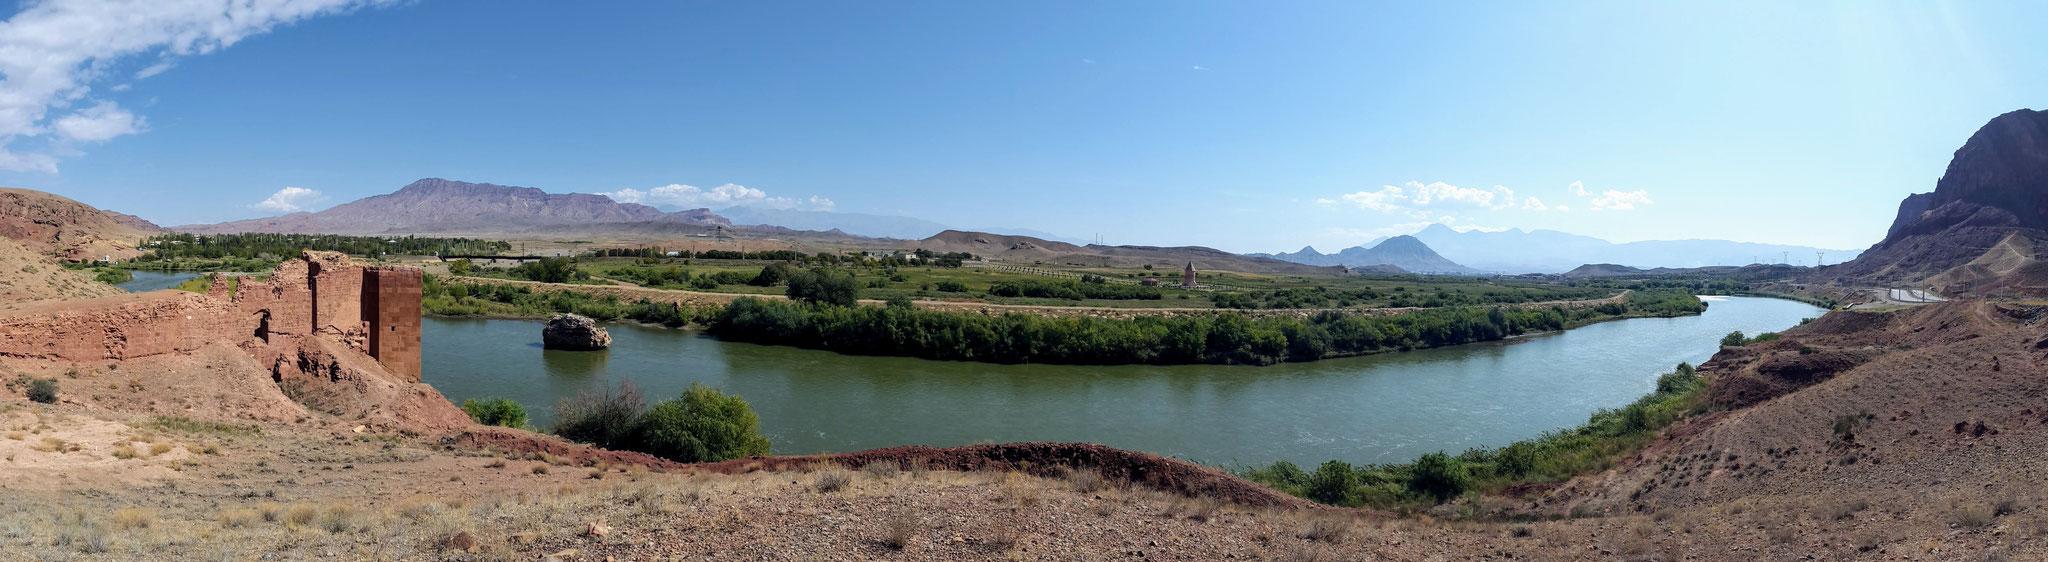 Brückenruine am Fluss Arax